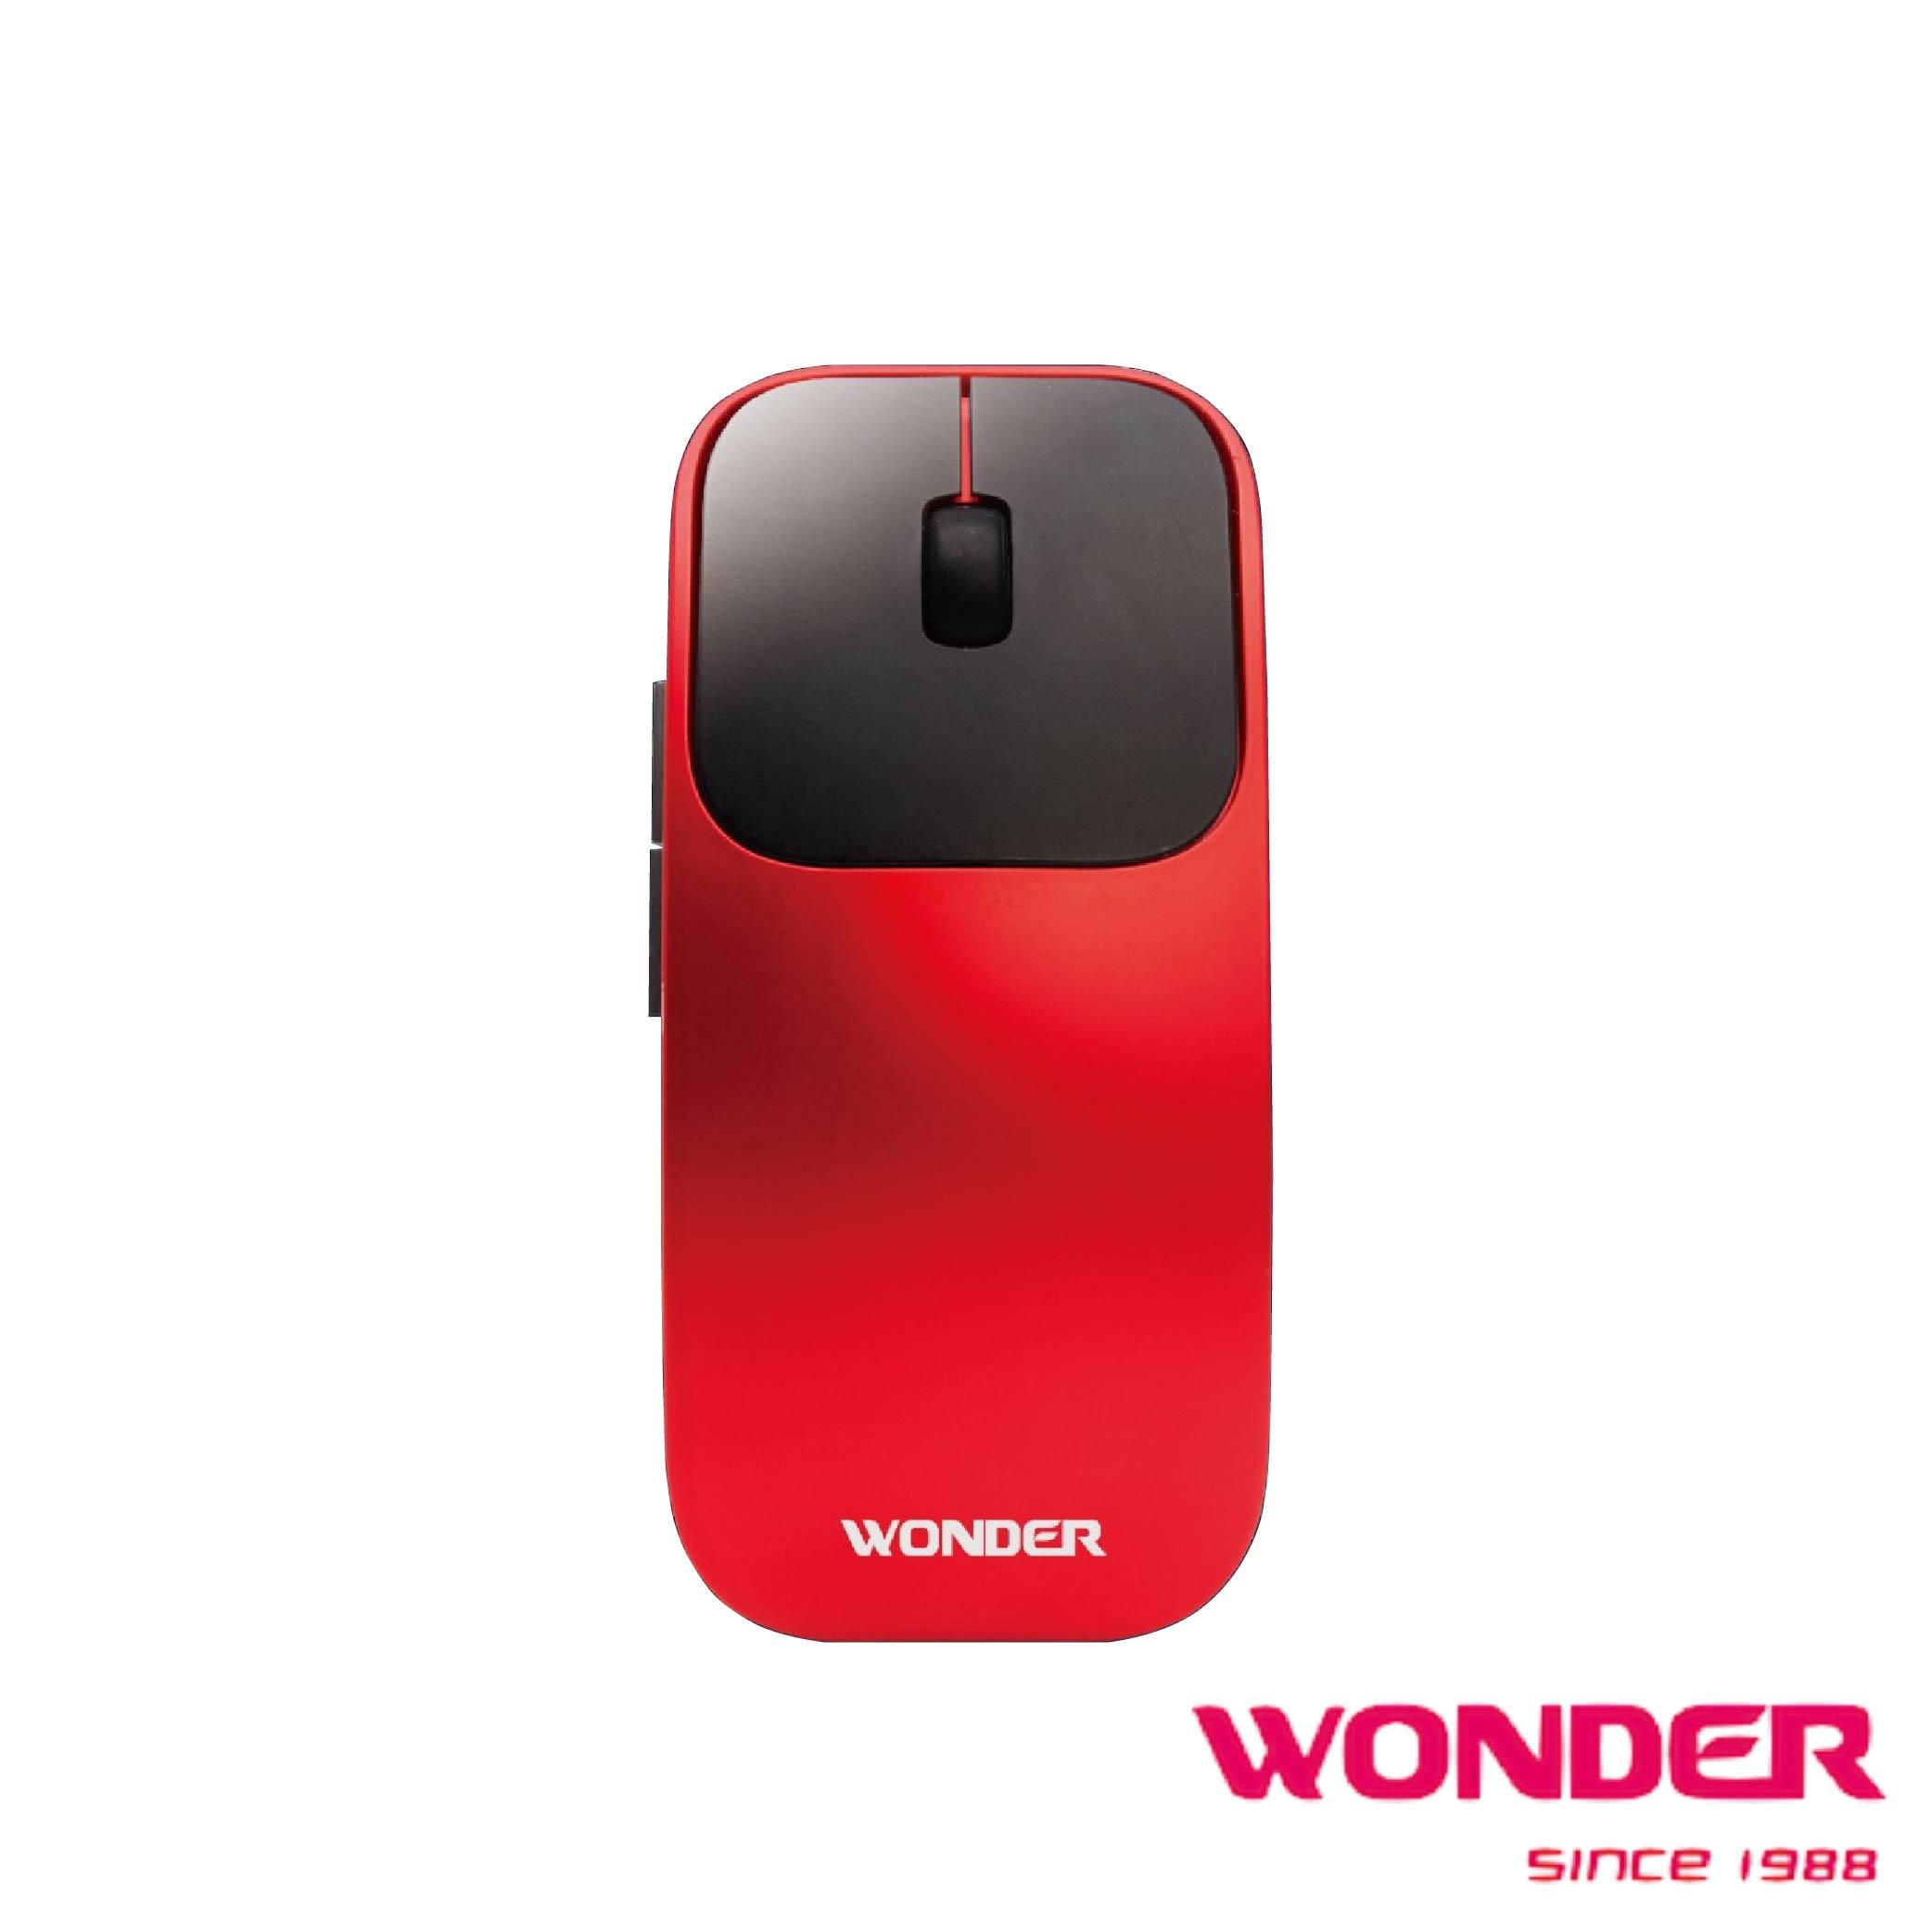 【WONDER】AI無線語音打字翻譯滑鼠-紅